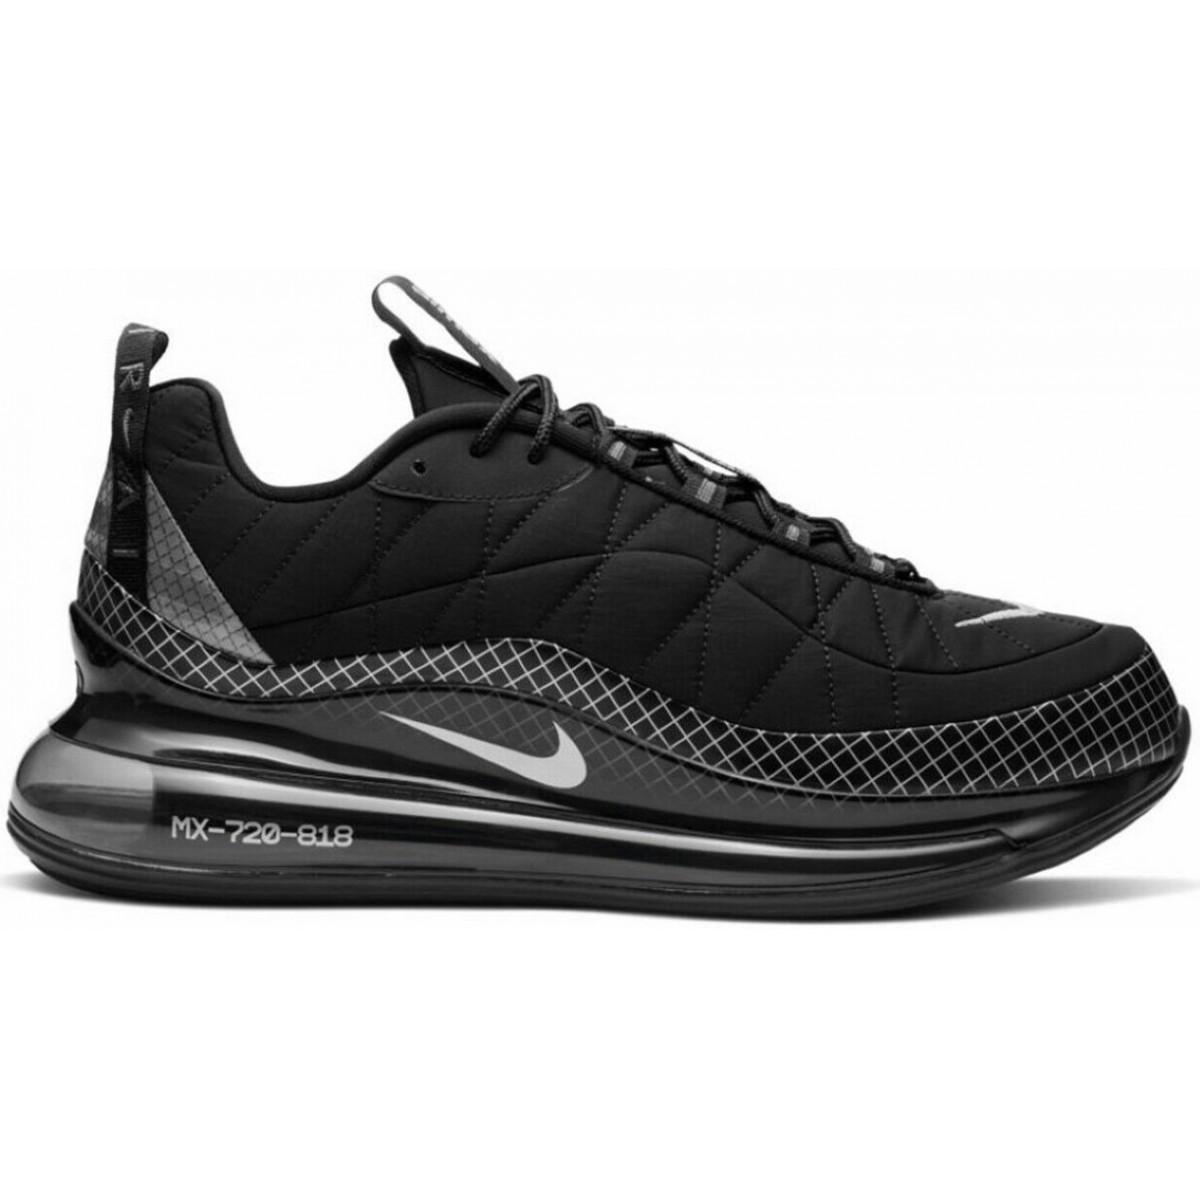 Nike MX 720 818 Black CI3871-001